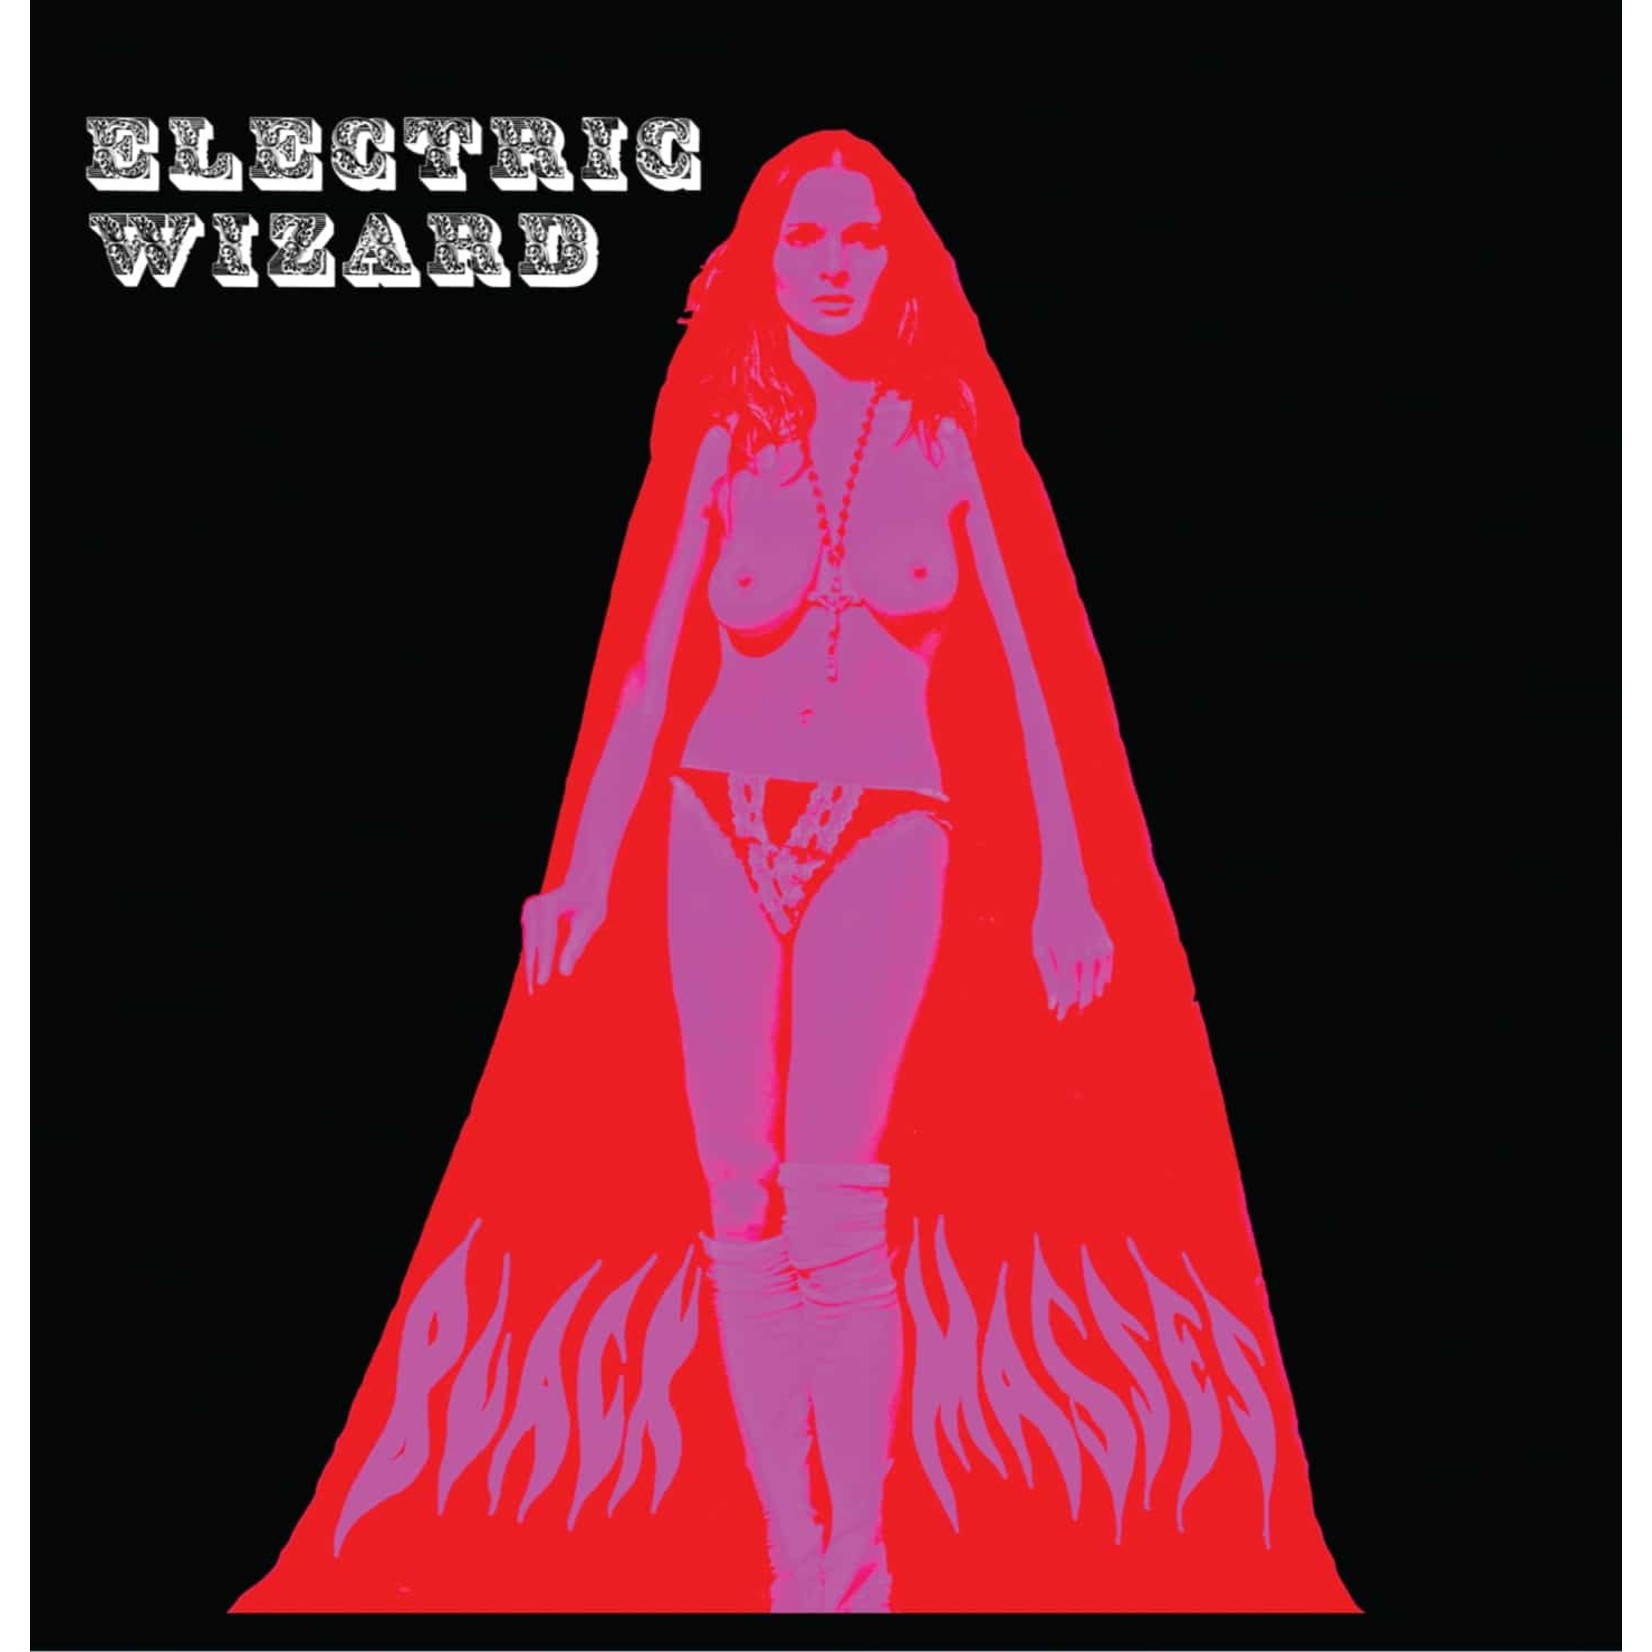 [New] Electric Wizard: Black Masses (2LP)